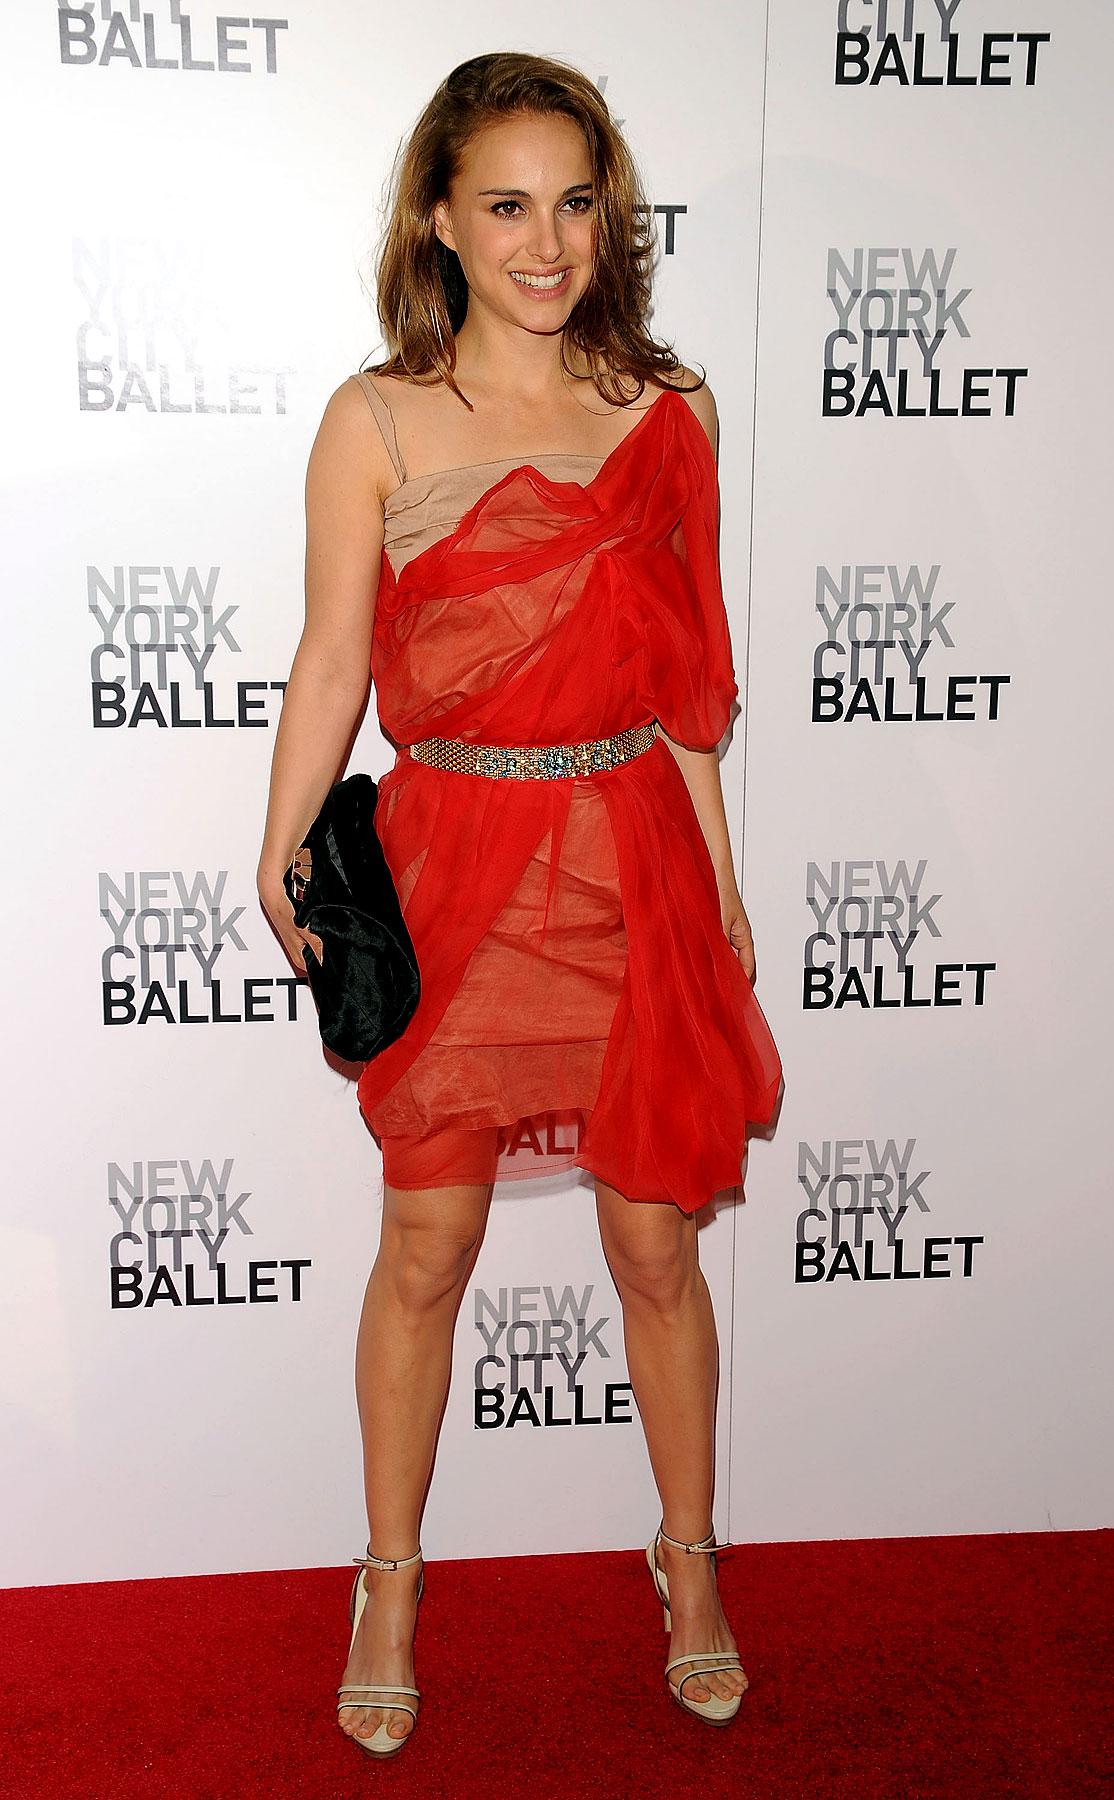 Fashion FTW: Natalie Portman Wears Red Cobweb Well (PHOTOS)